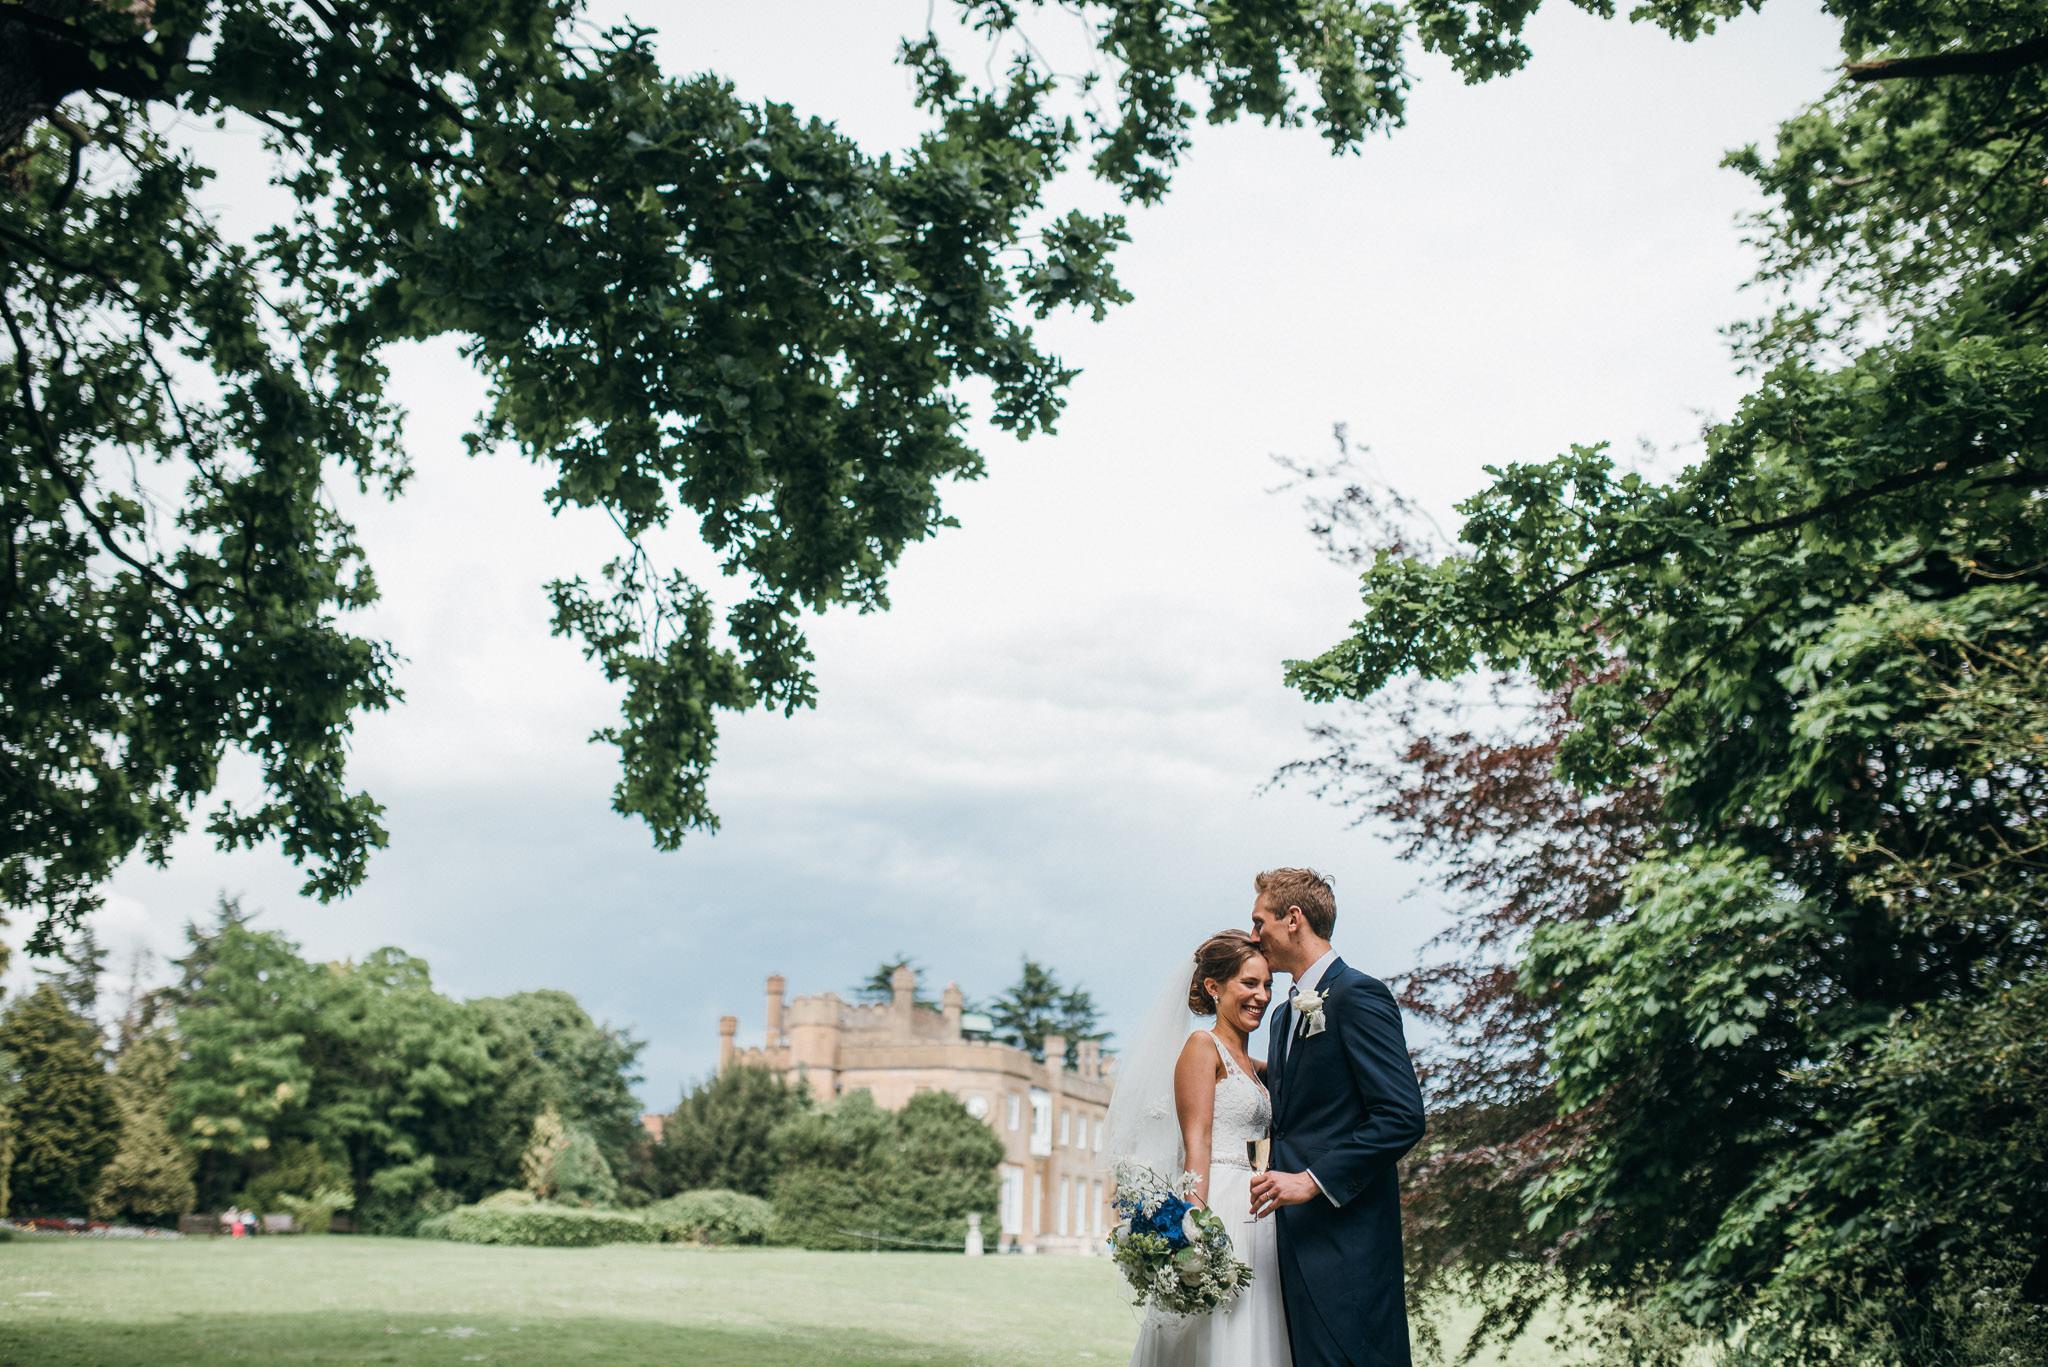 Nonsuch wedding venue simon biffen photography 2